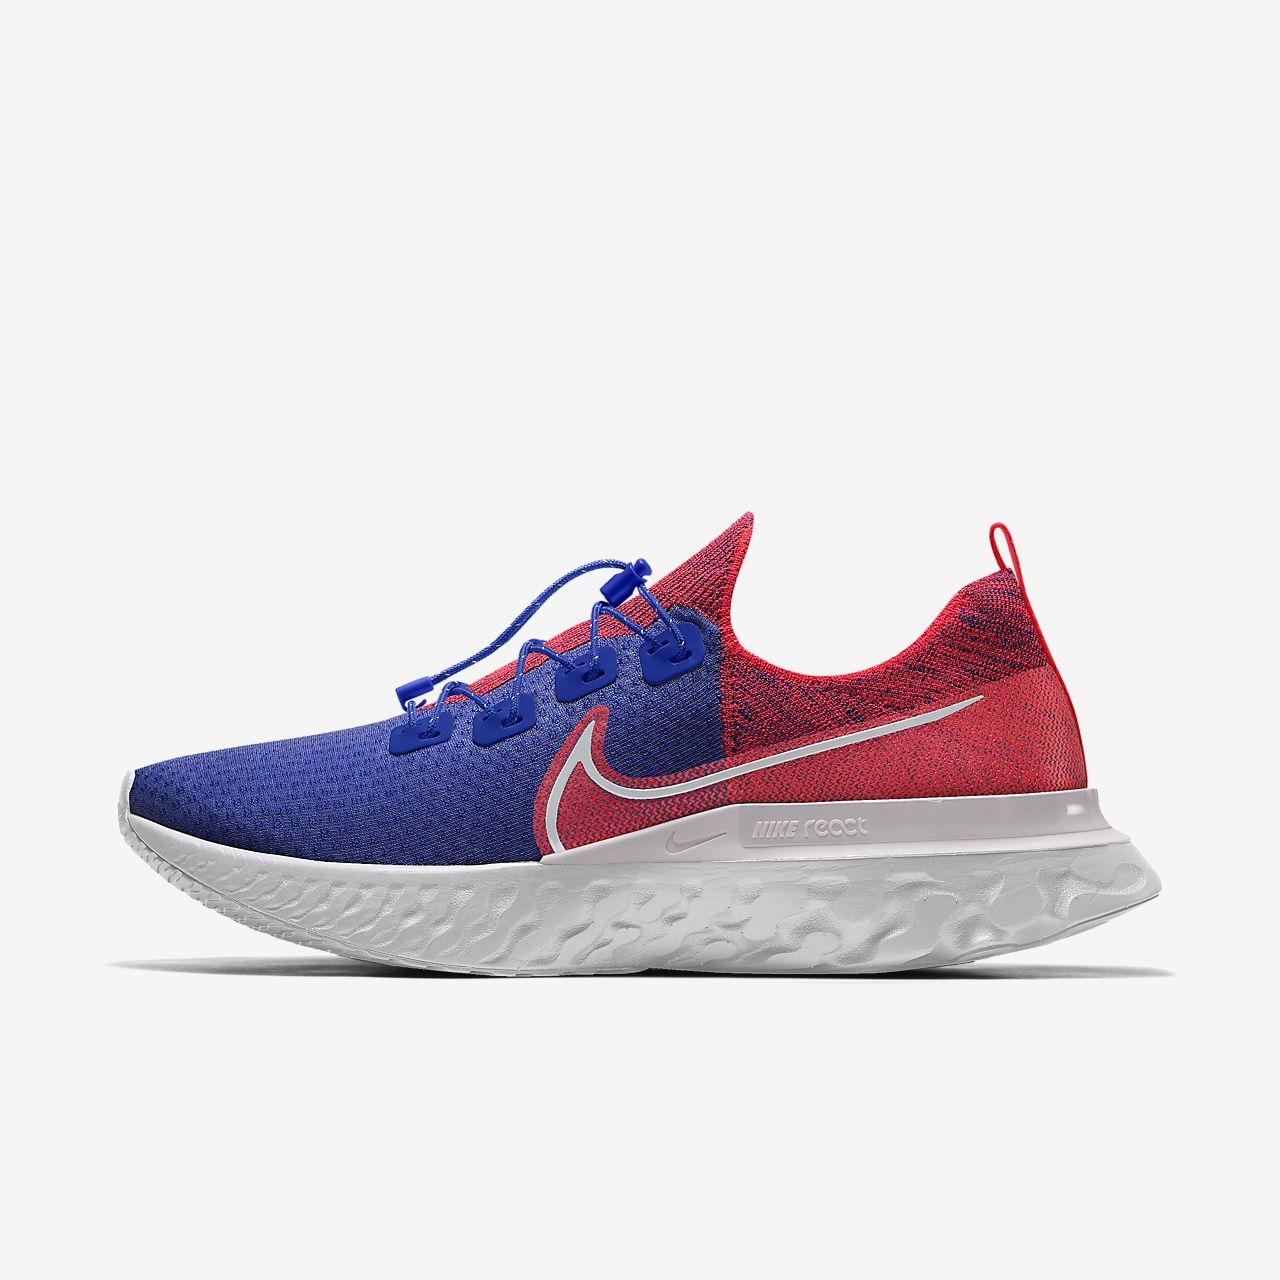 Nike React Infinity Run Flyknit By You 专属定制女子跑步鞋